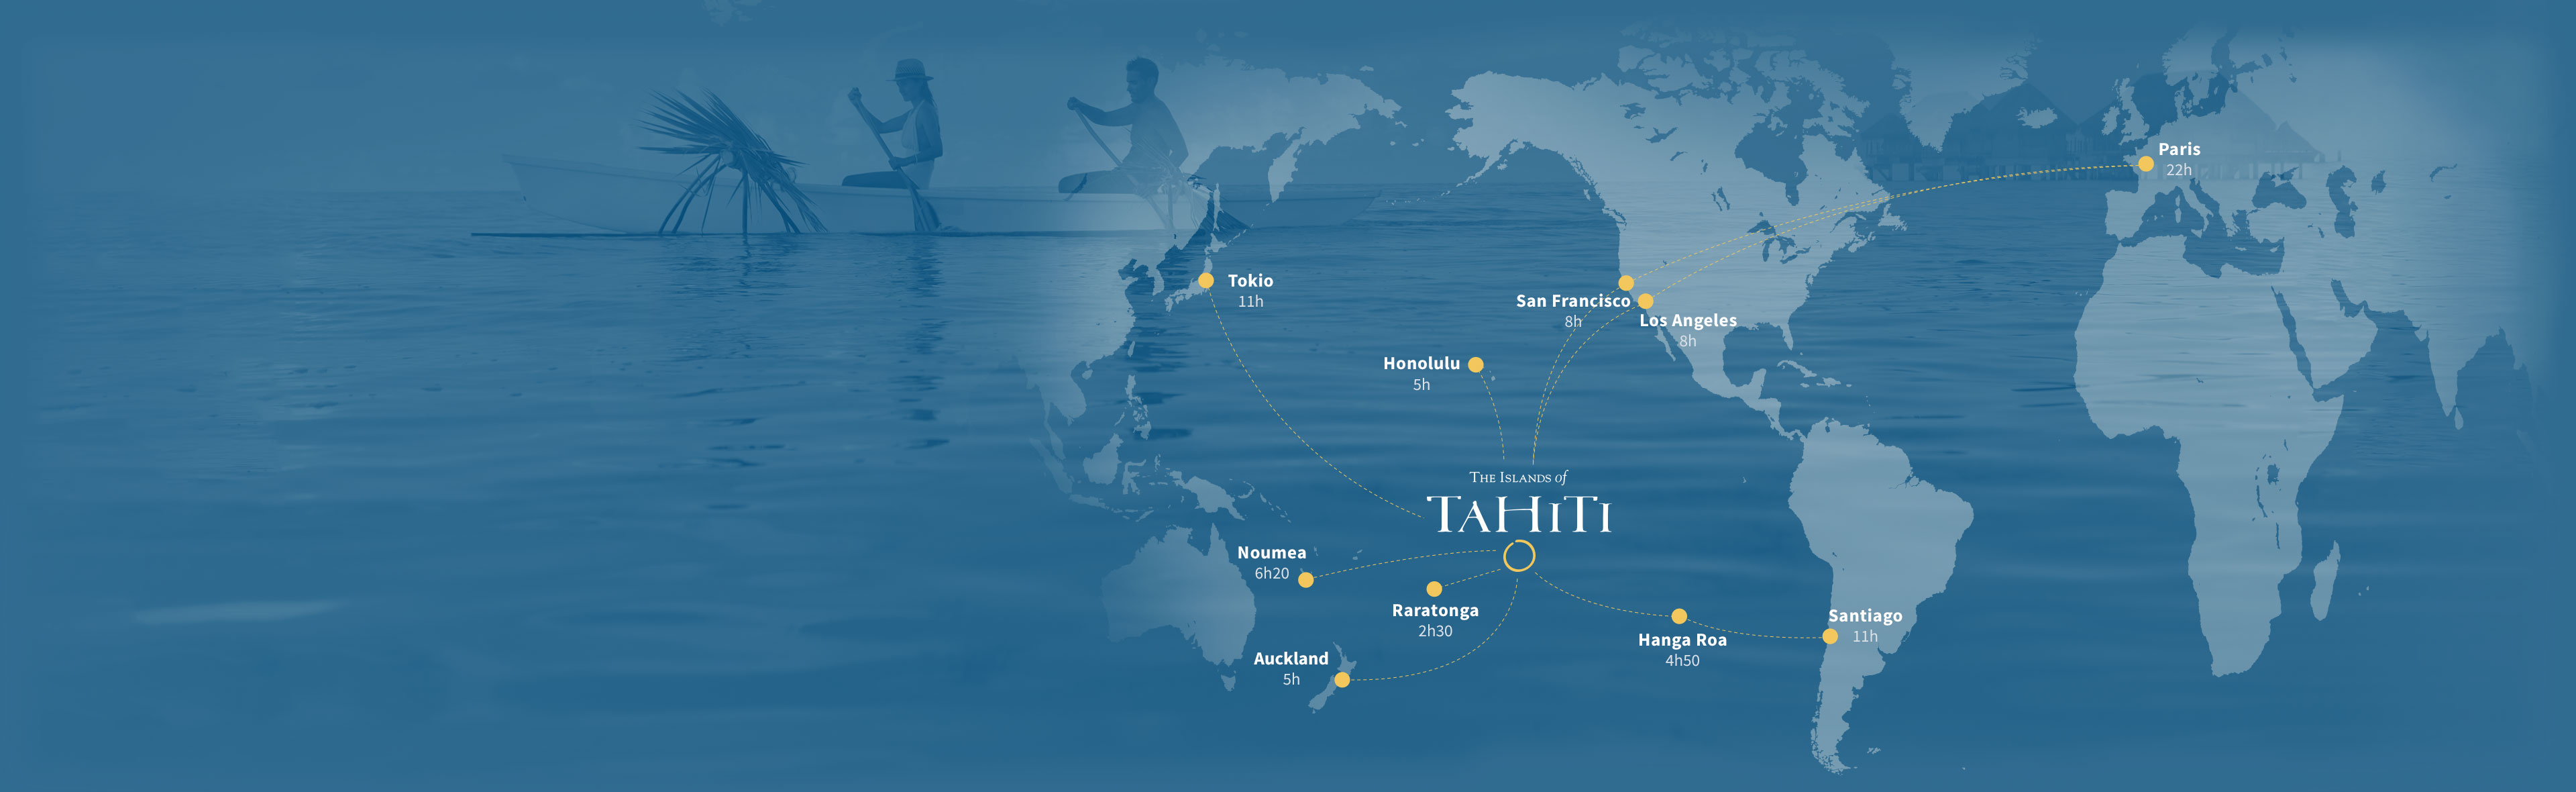 tahiti-homepage-map-d_german | Tahiti Tourisme